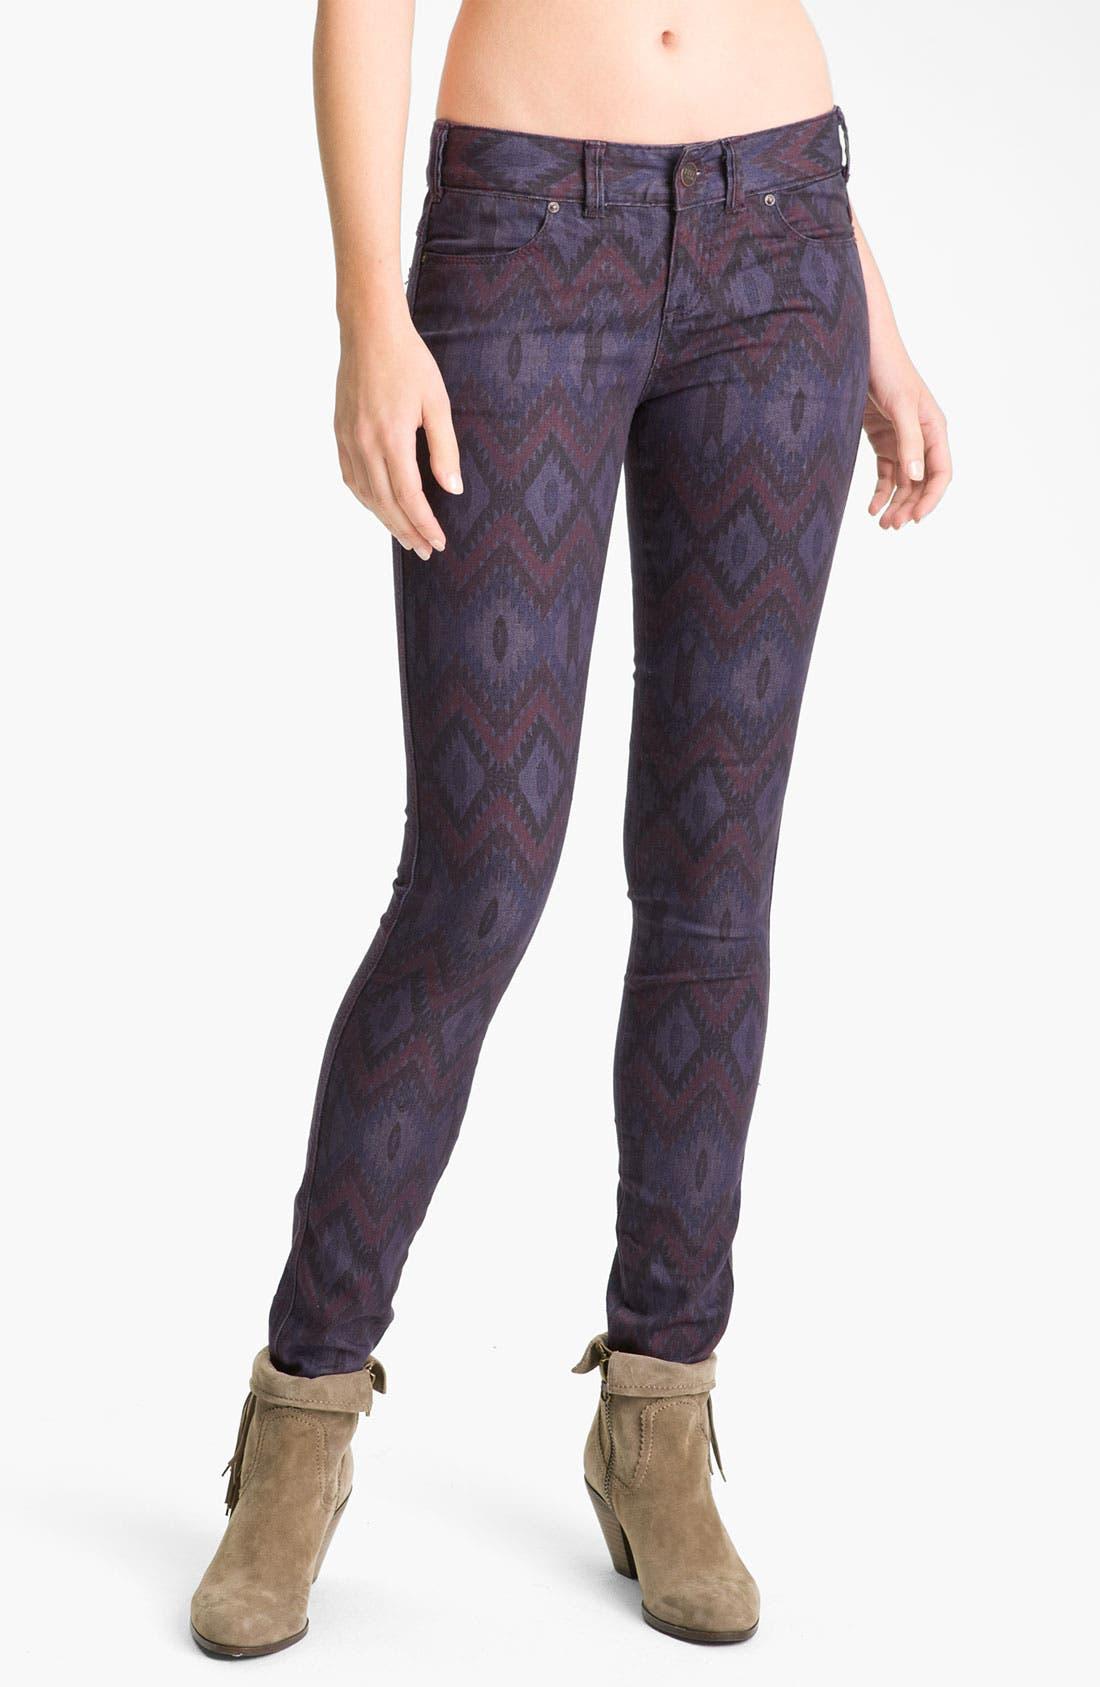 Alternate Image 1 Selected - Free People Ikat Print Skinny Jeans